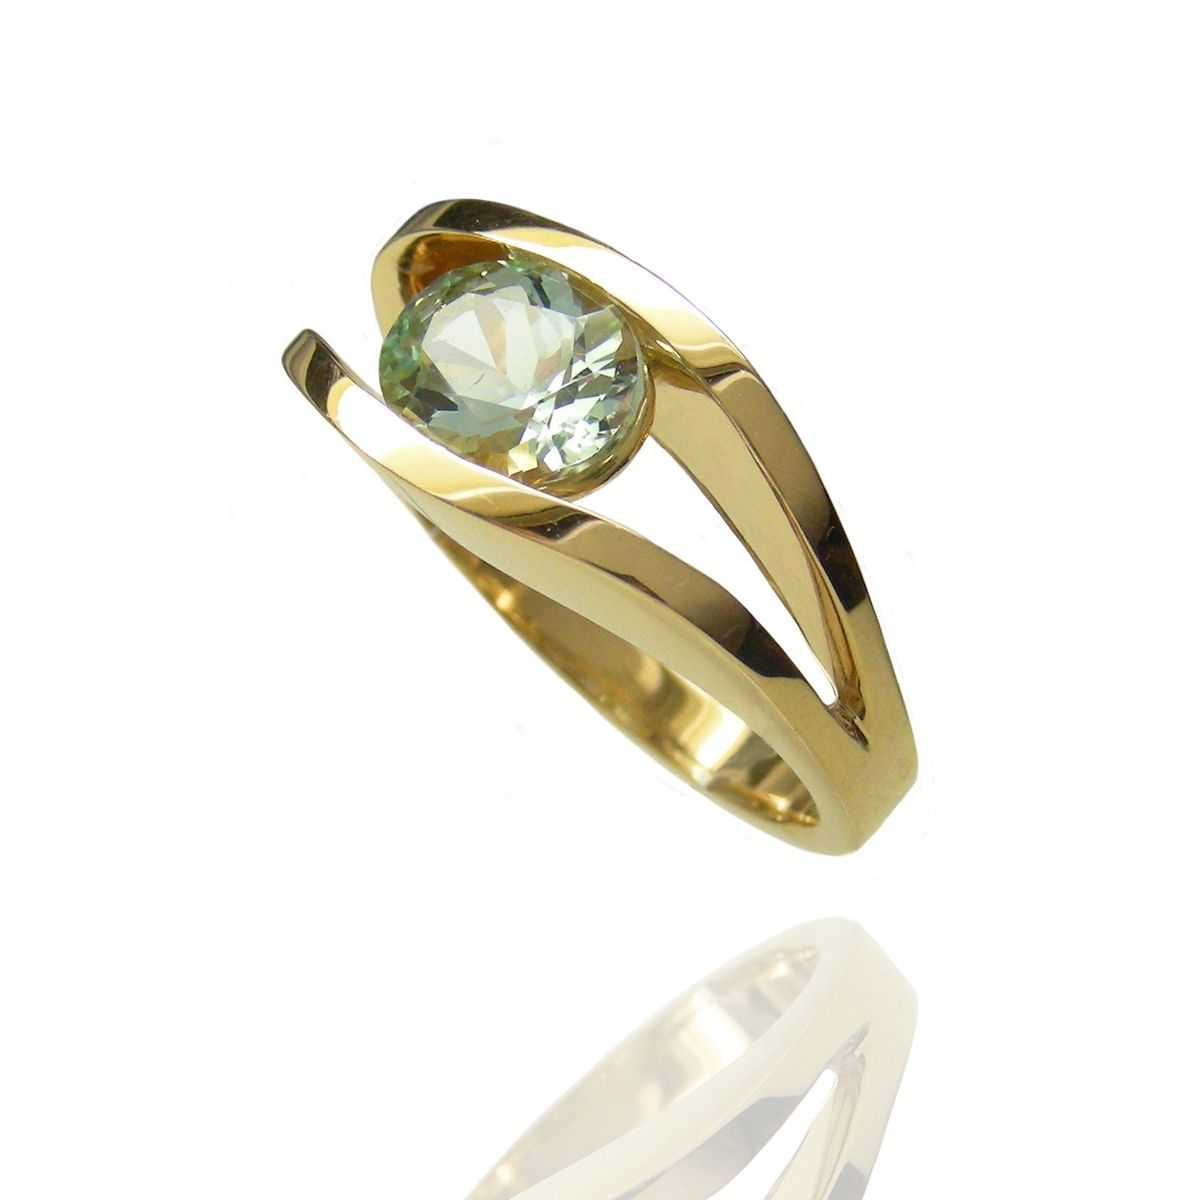 awesome Как выглядит камень берилл? (50 фото) — Его свойства и значение Читай больше http://avrorra.com/kak-vyglyadit-kamen-berill-foto-svojstva-i-znachenie/